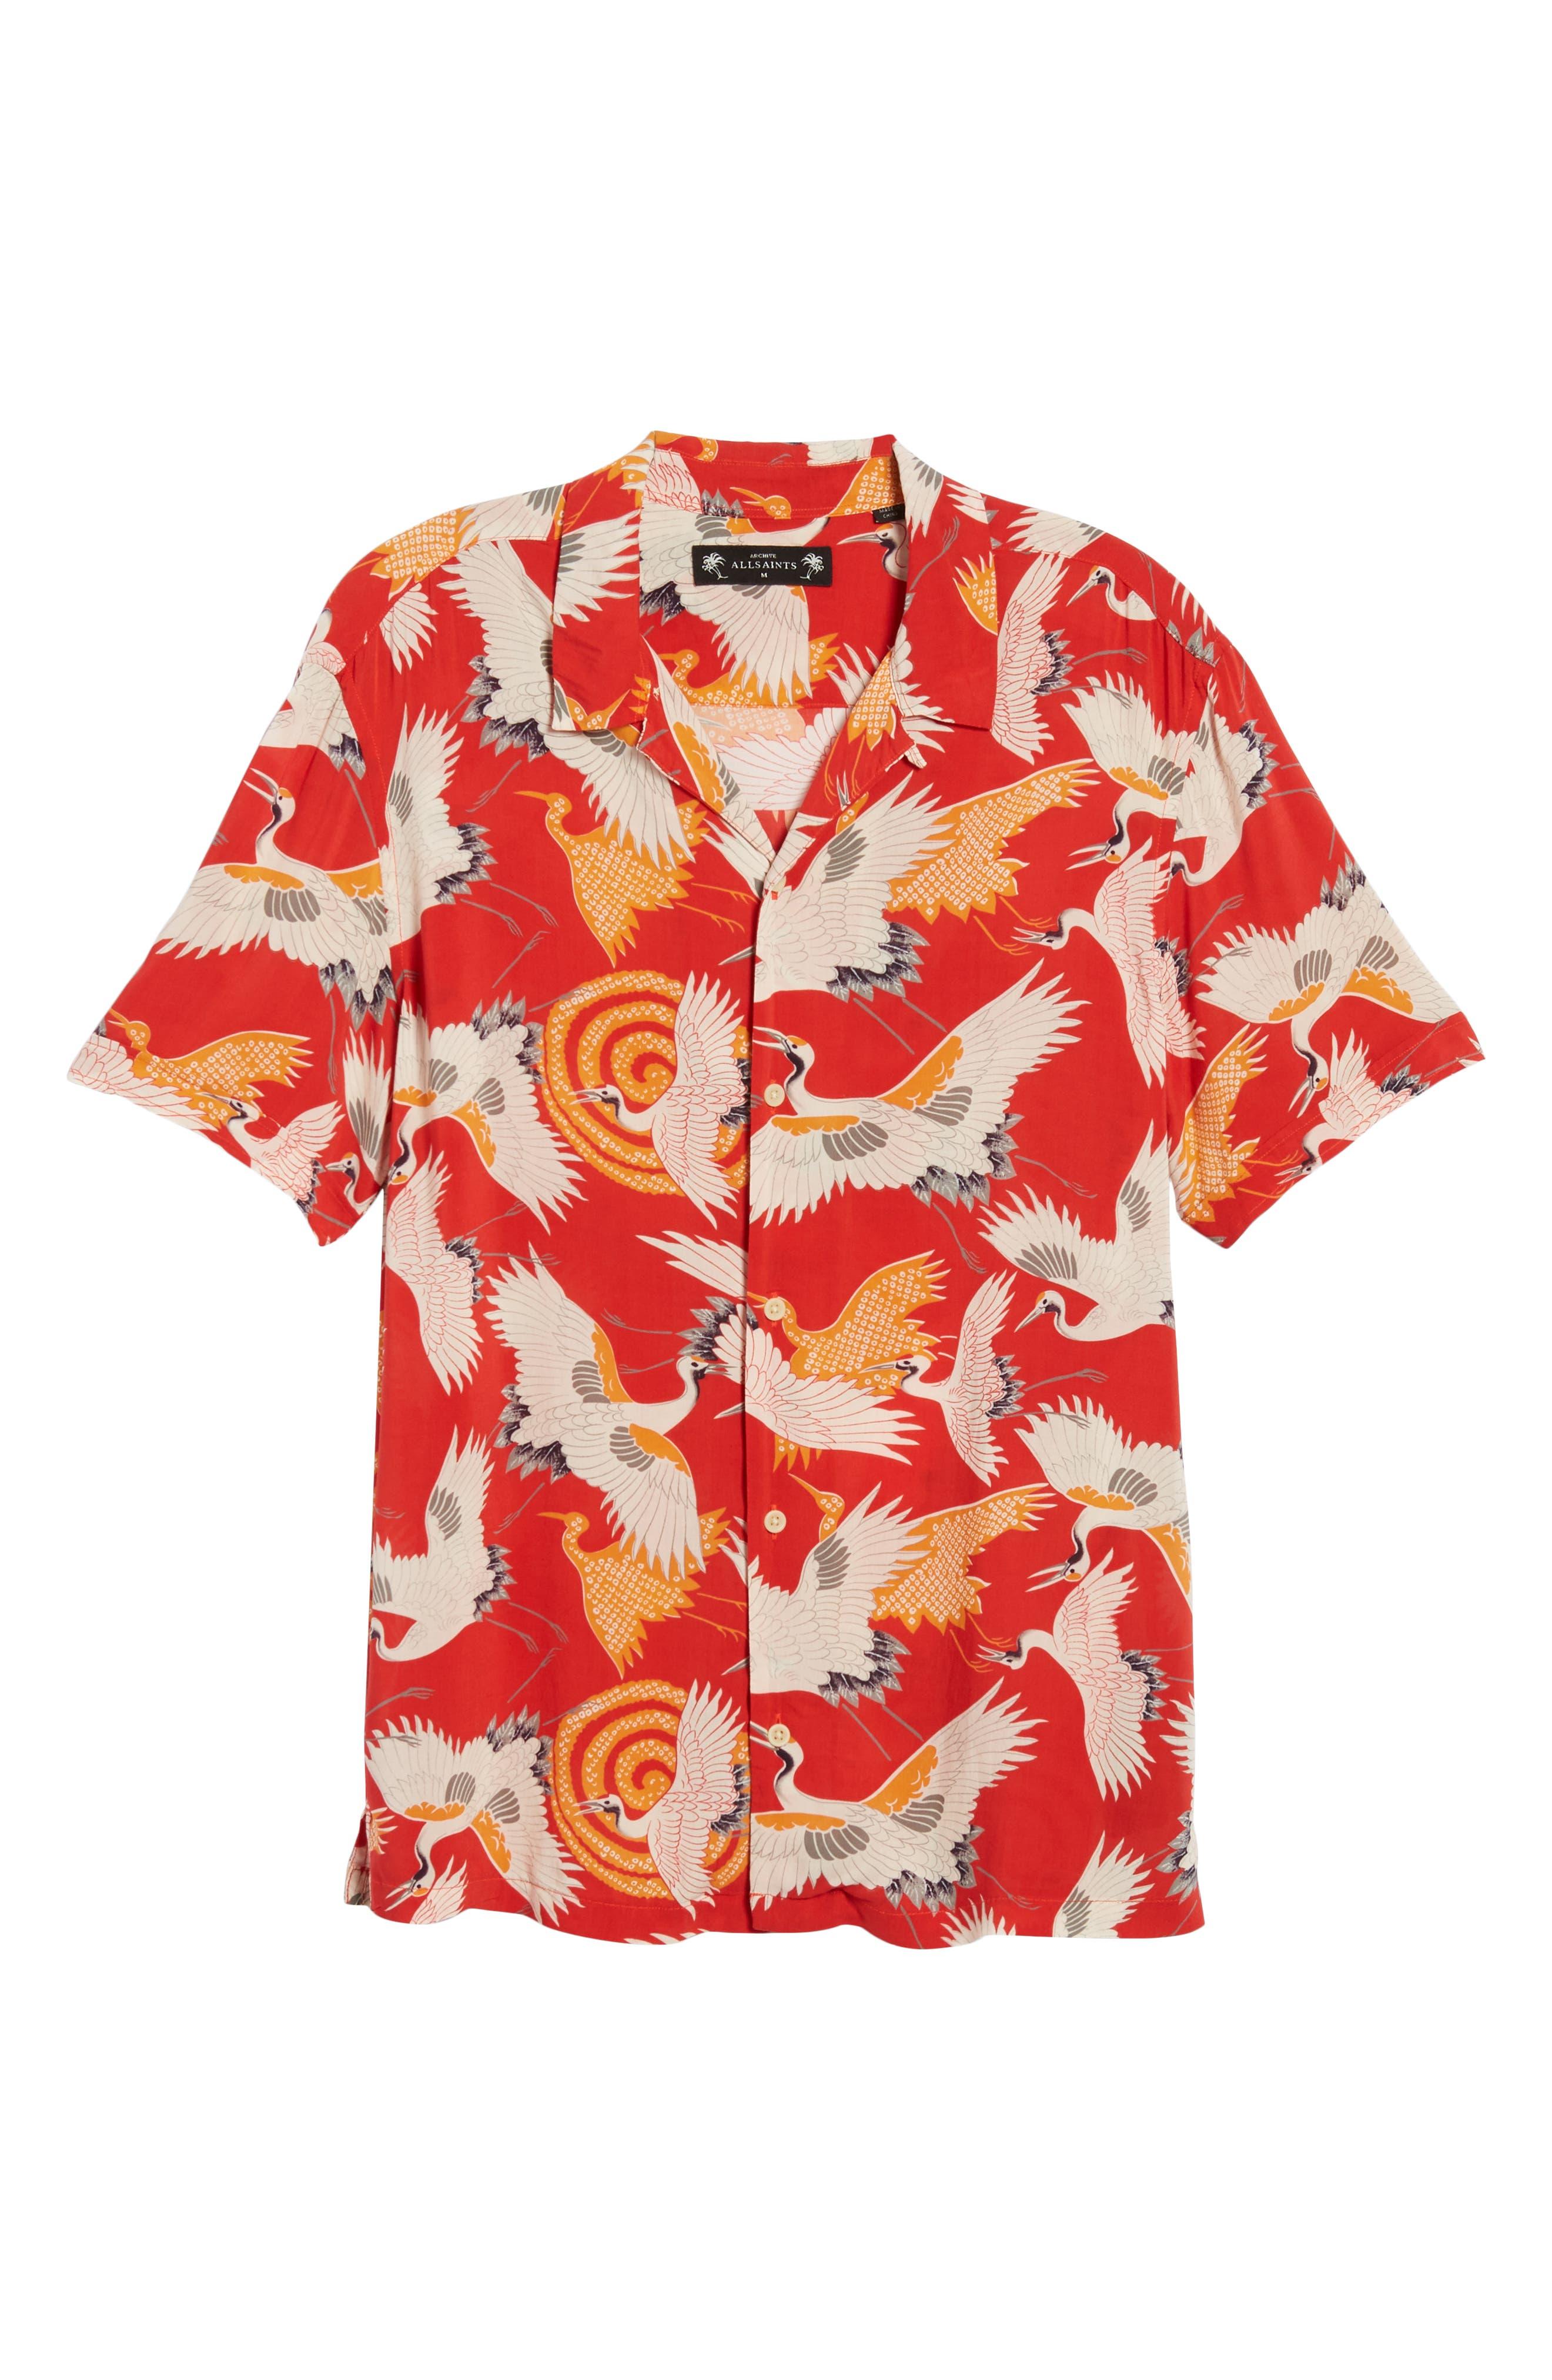 Tsuru Regular Fit Short Sleeve Sport Shirt,                             Alternate thumbnail 6, color,                             600